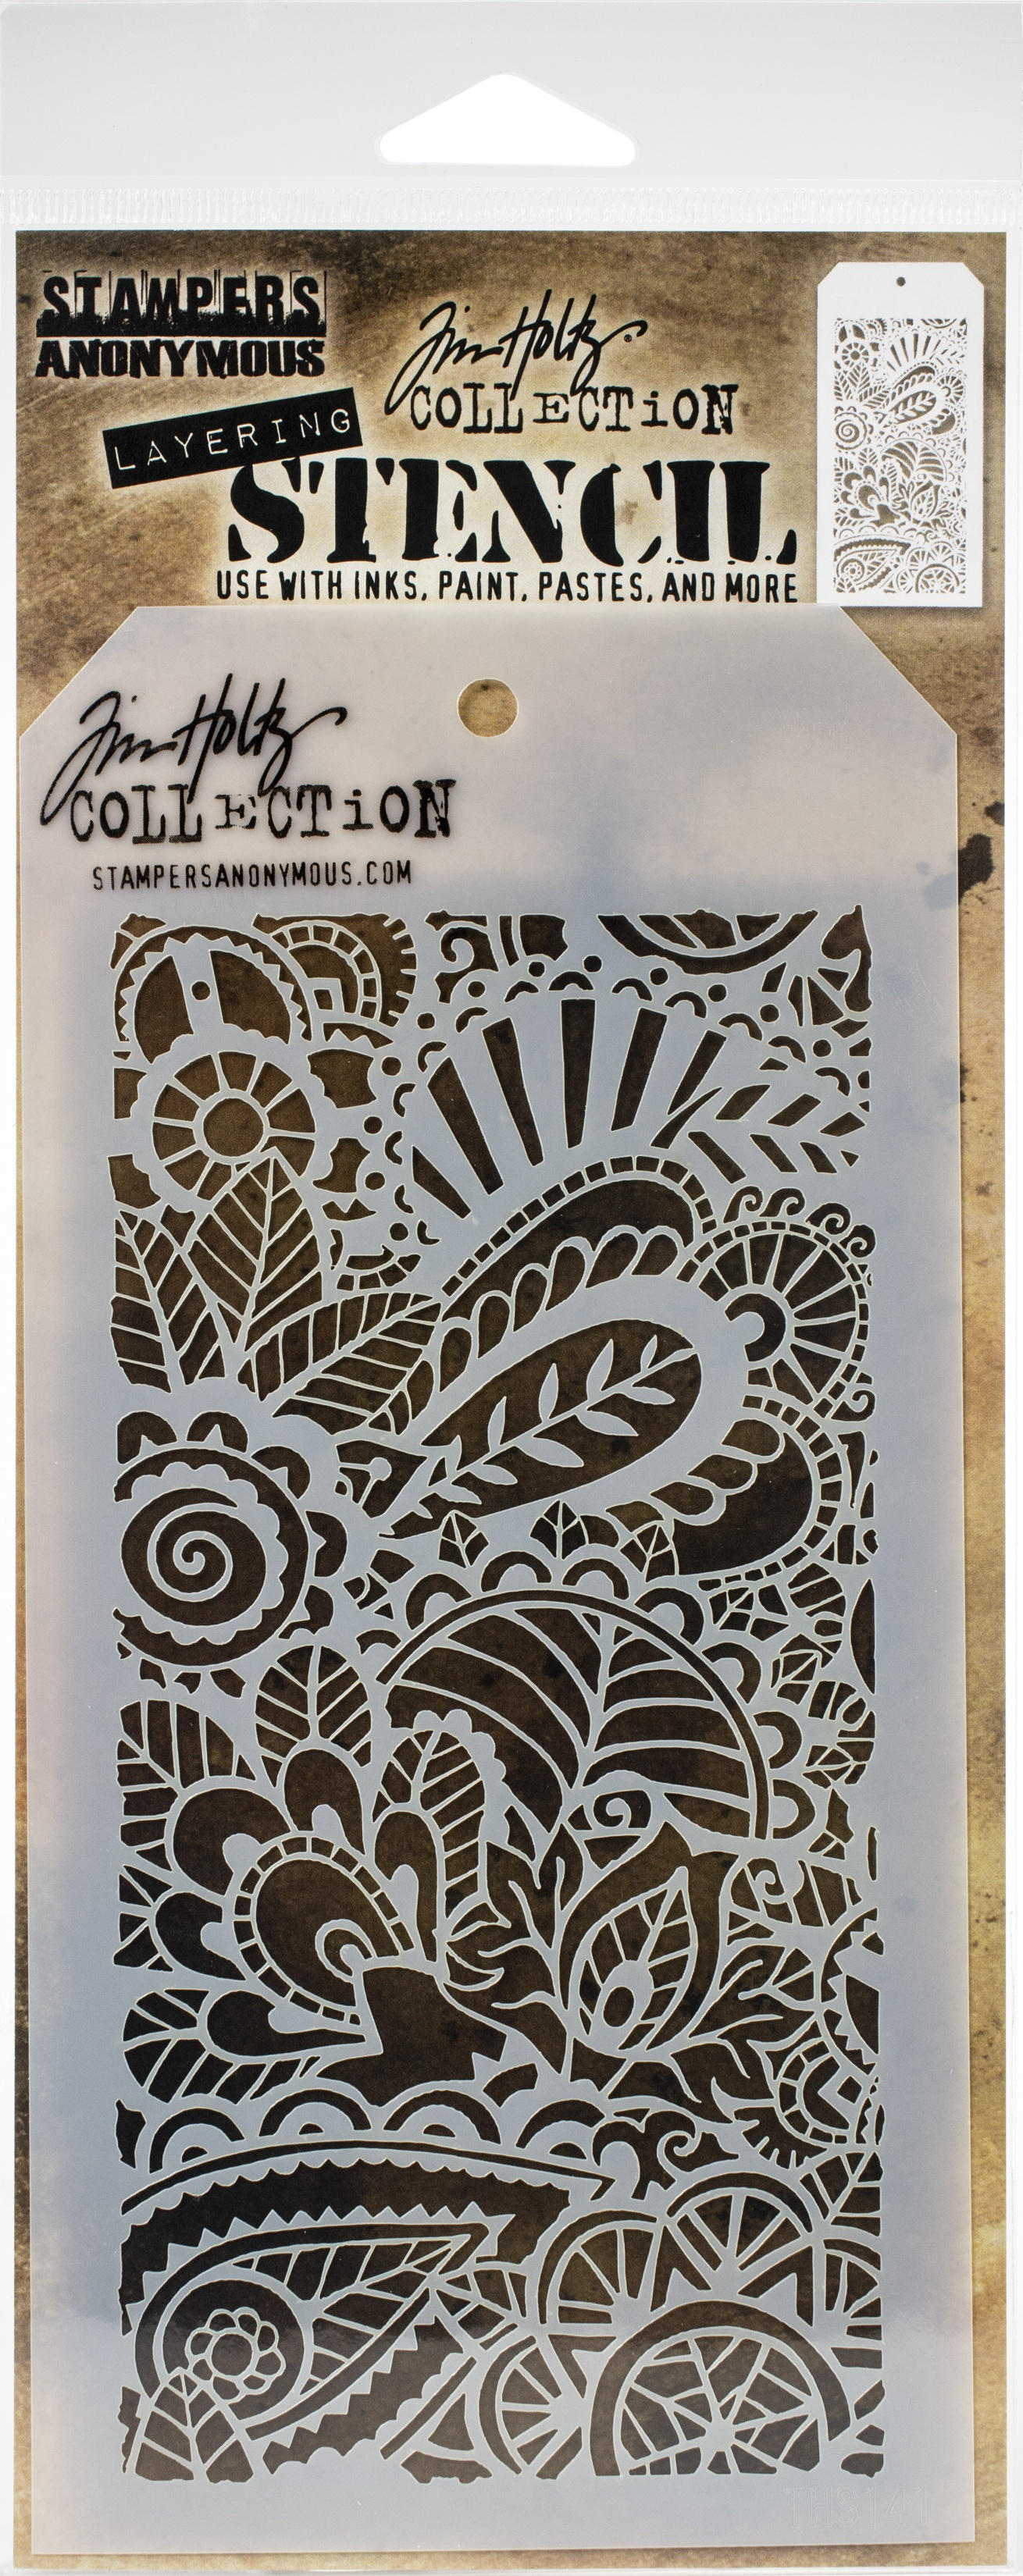 Tim Holtz Layered Stencil 4.125X8.5-Doodle Art 1 -Layered